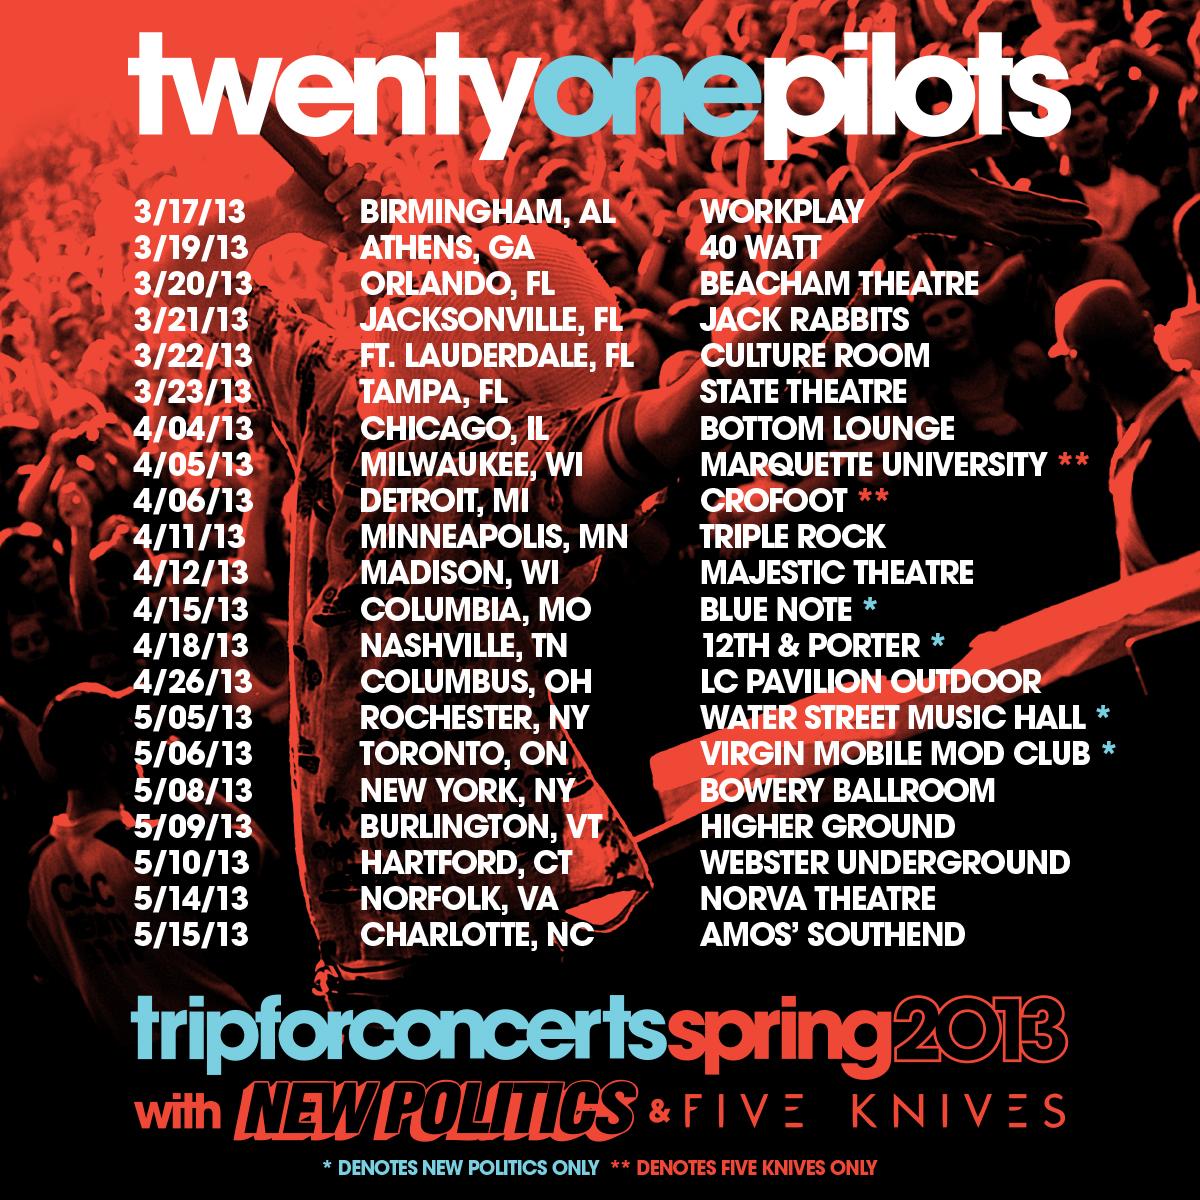 Twenty one pilots tour dates